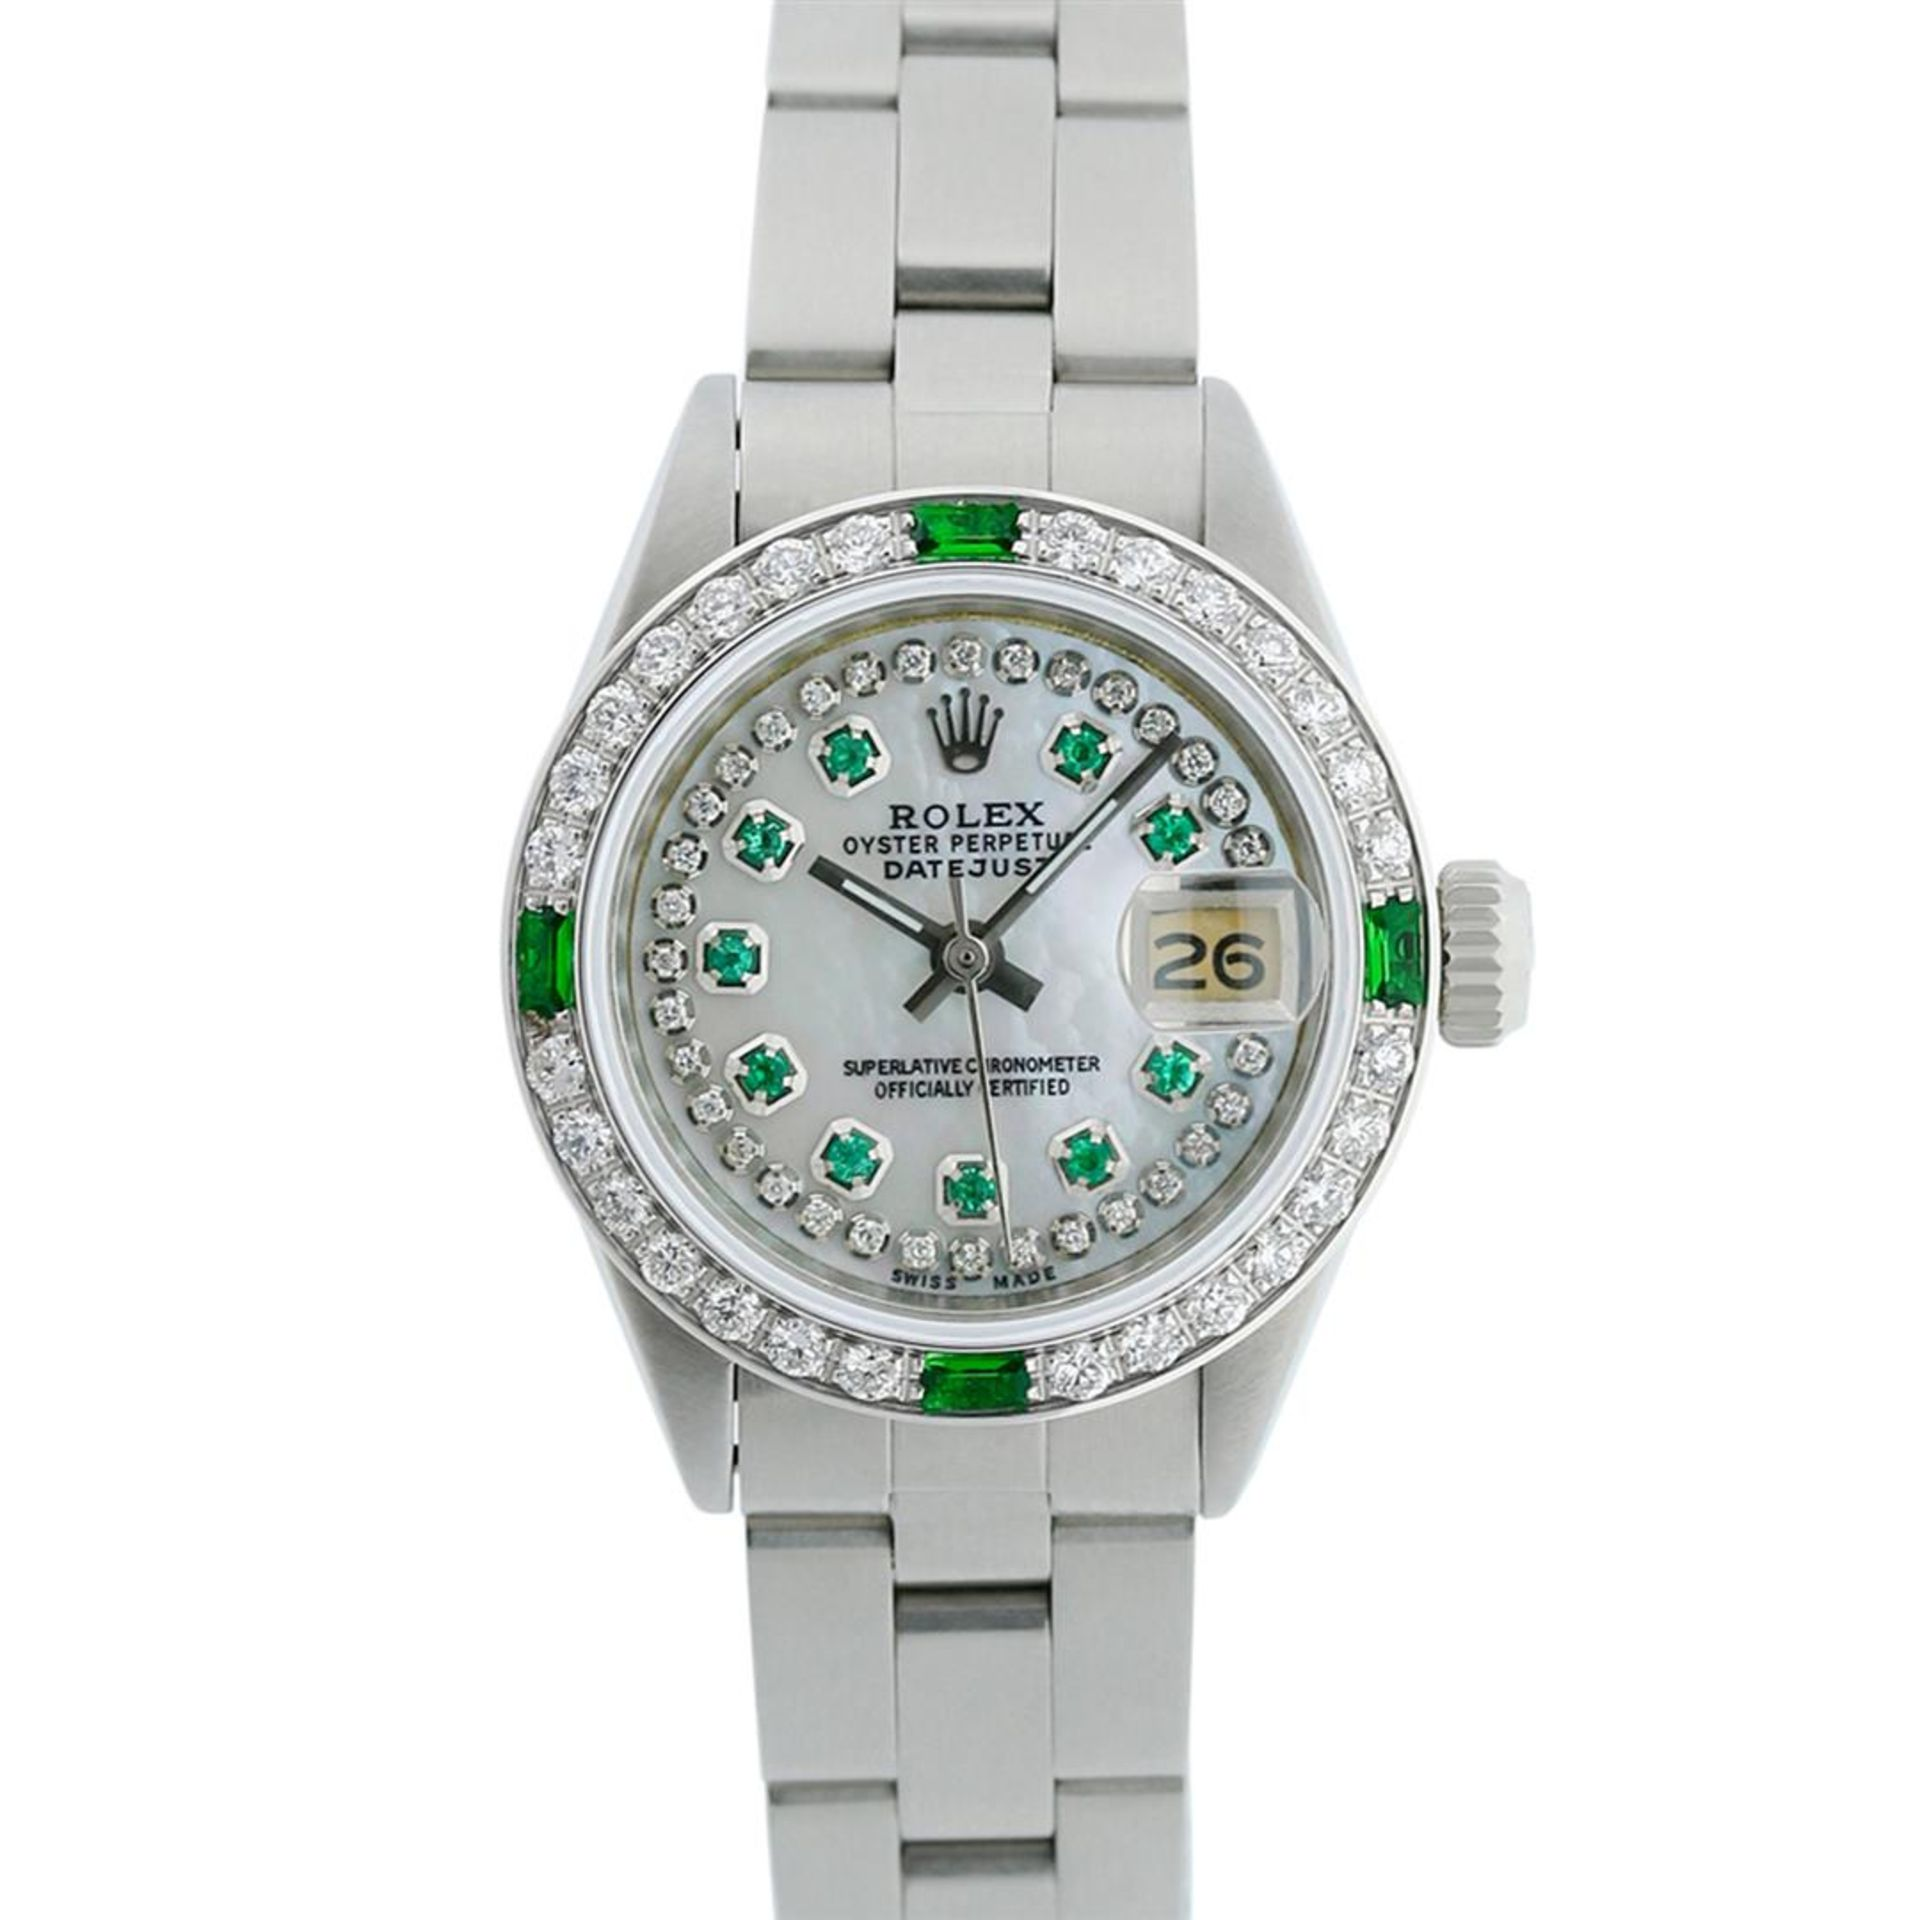 Rolex Ladies Stainless Steel MOP Emerald & Diamond Oyster Perpetaul Datejust Wri - Image 2 of 9